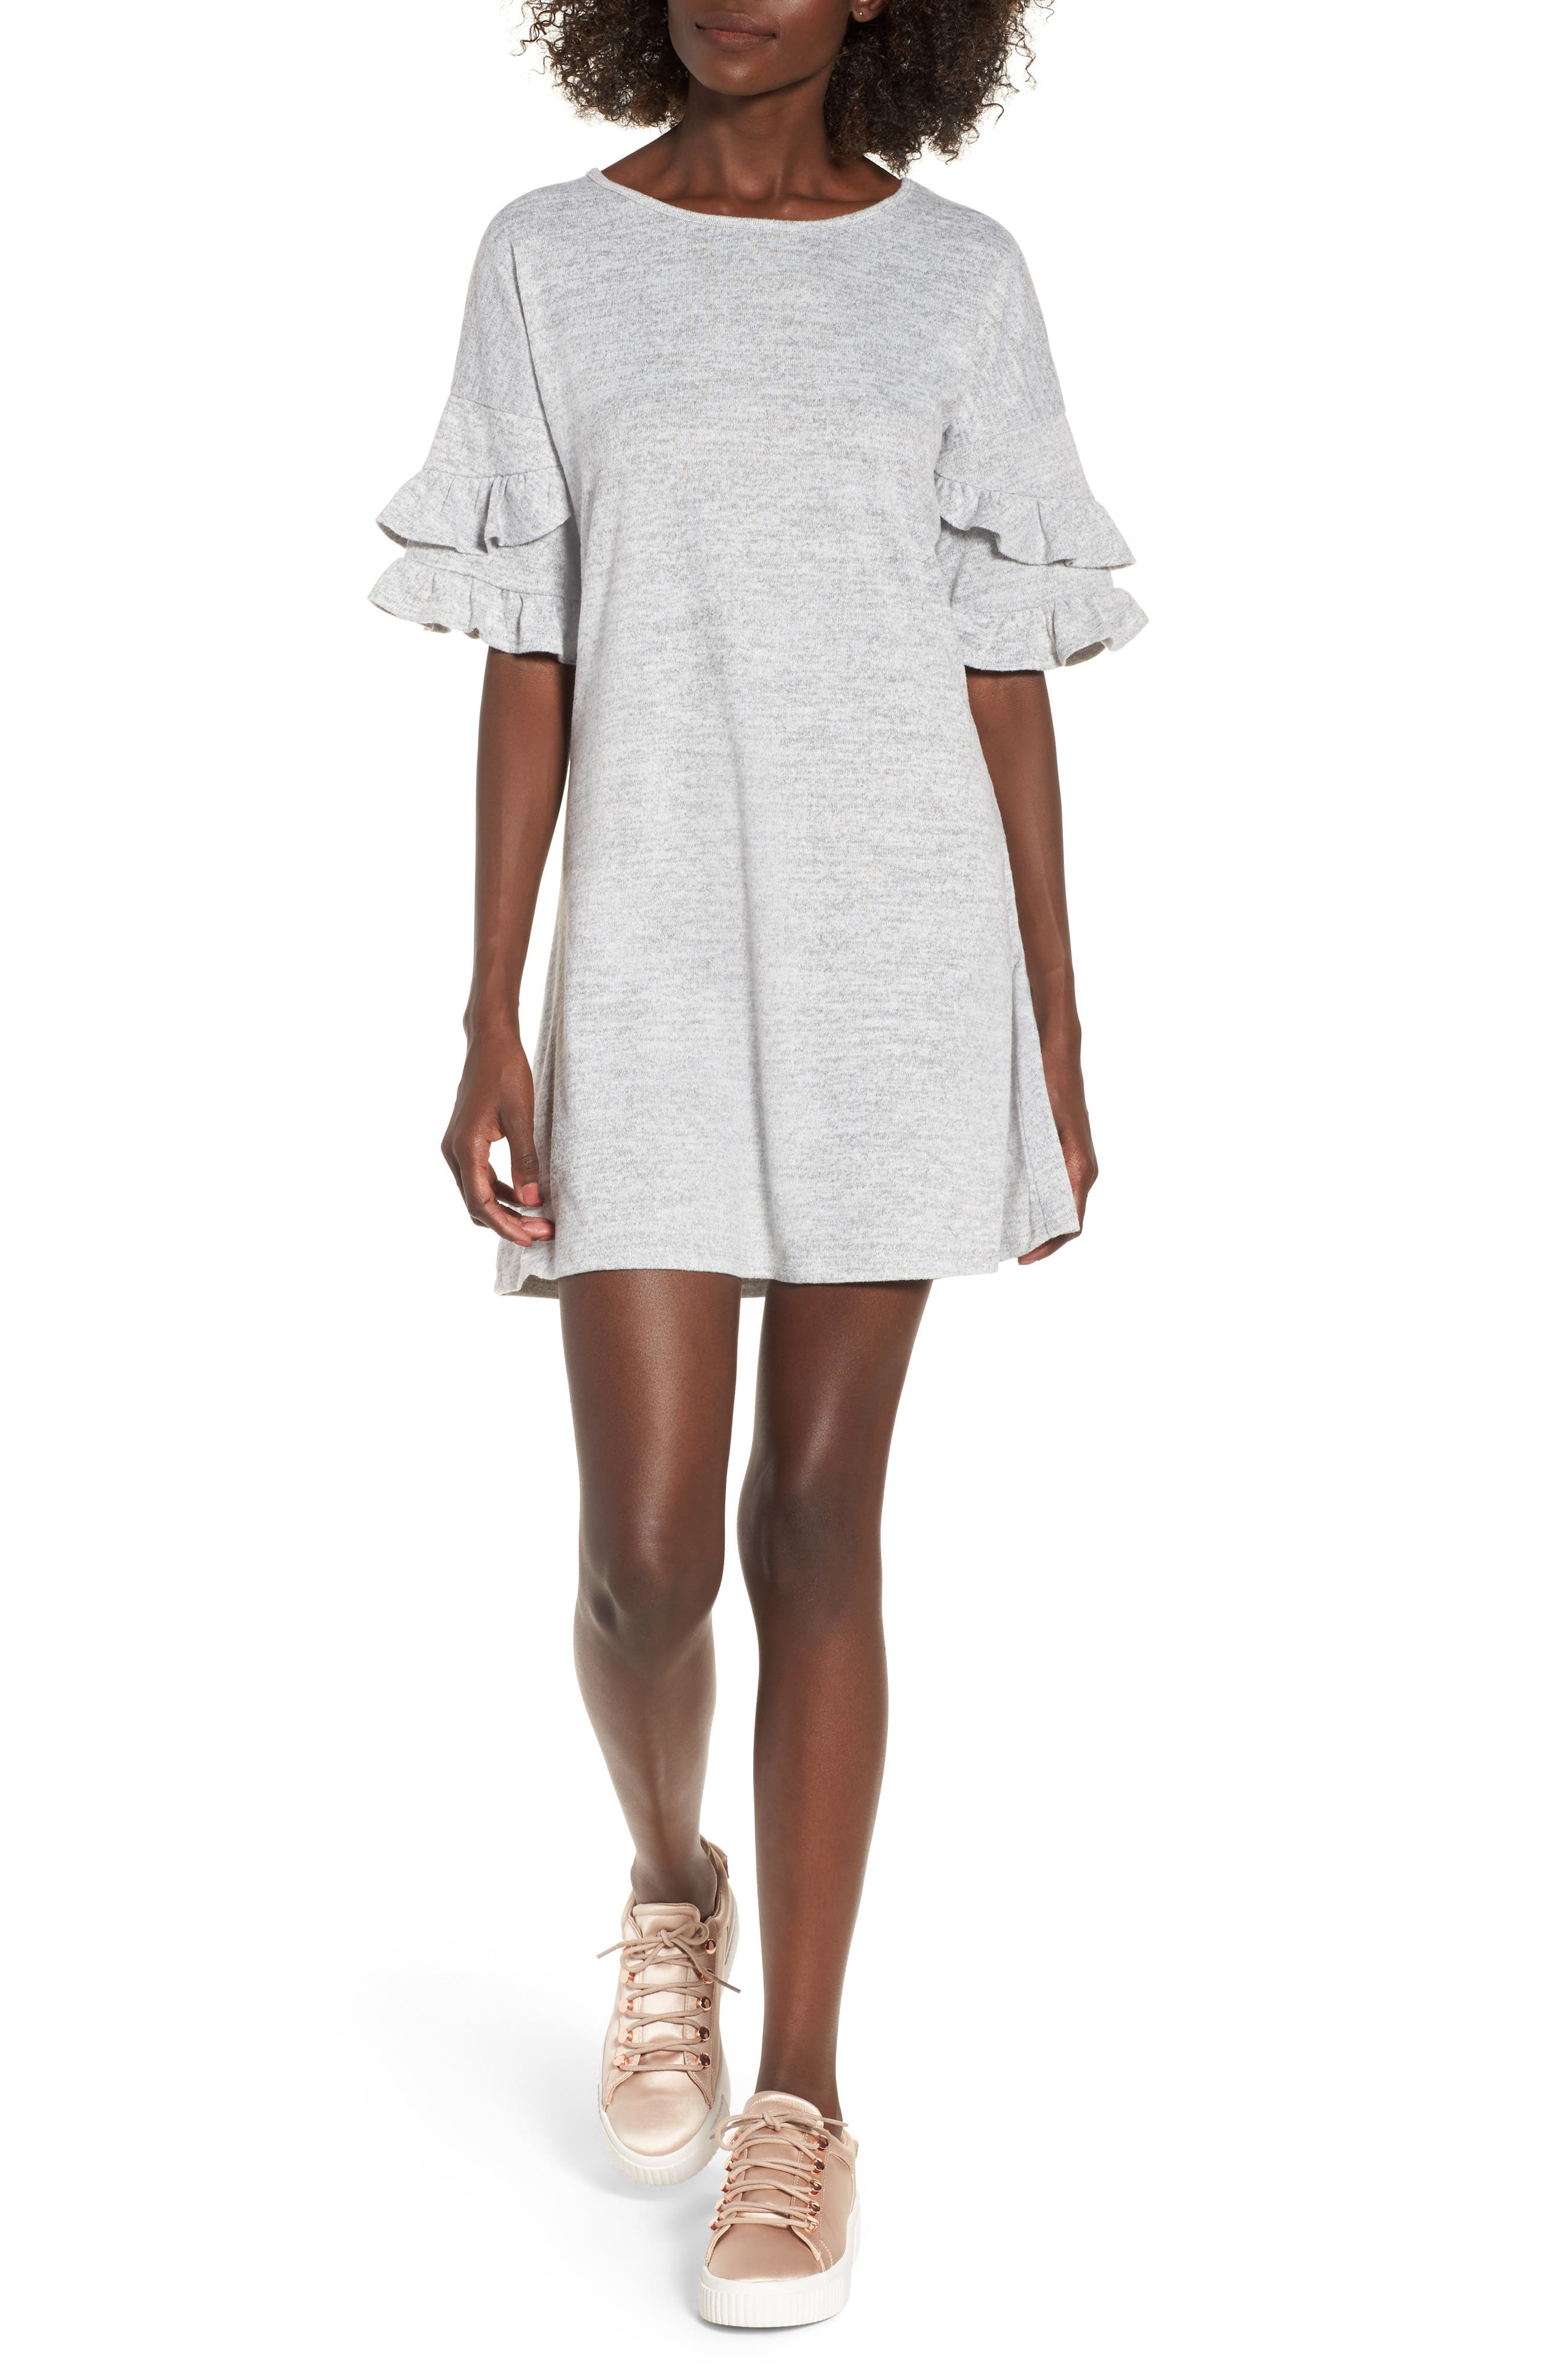 Ruffle Sleeve Sweatshirt Dress,                         Main,                         color, Heather Grey